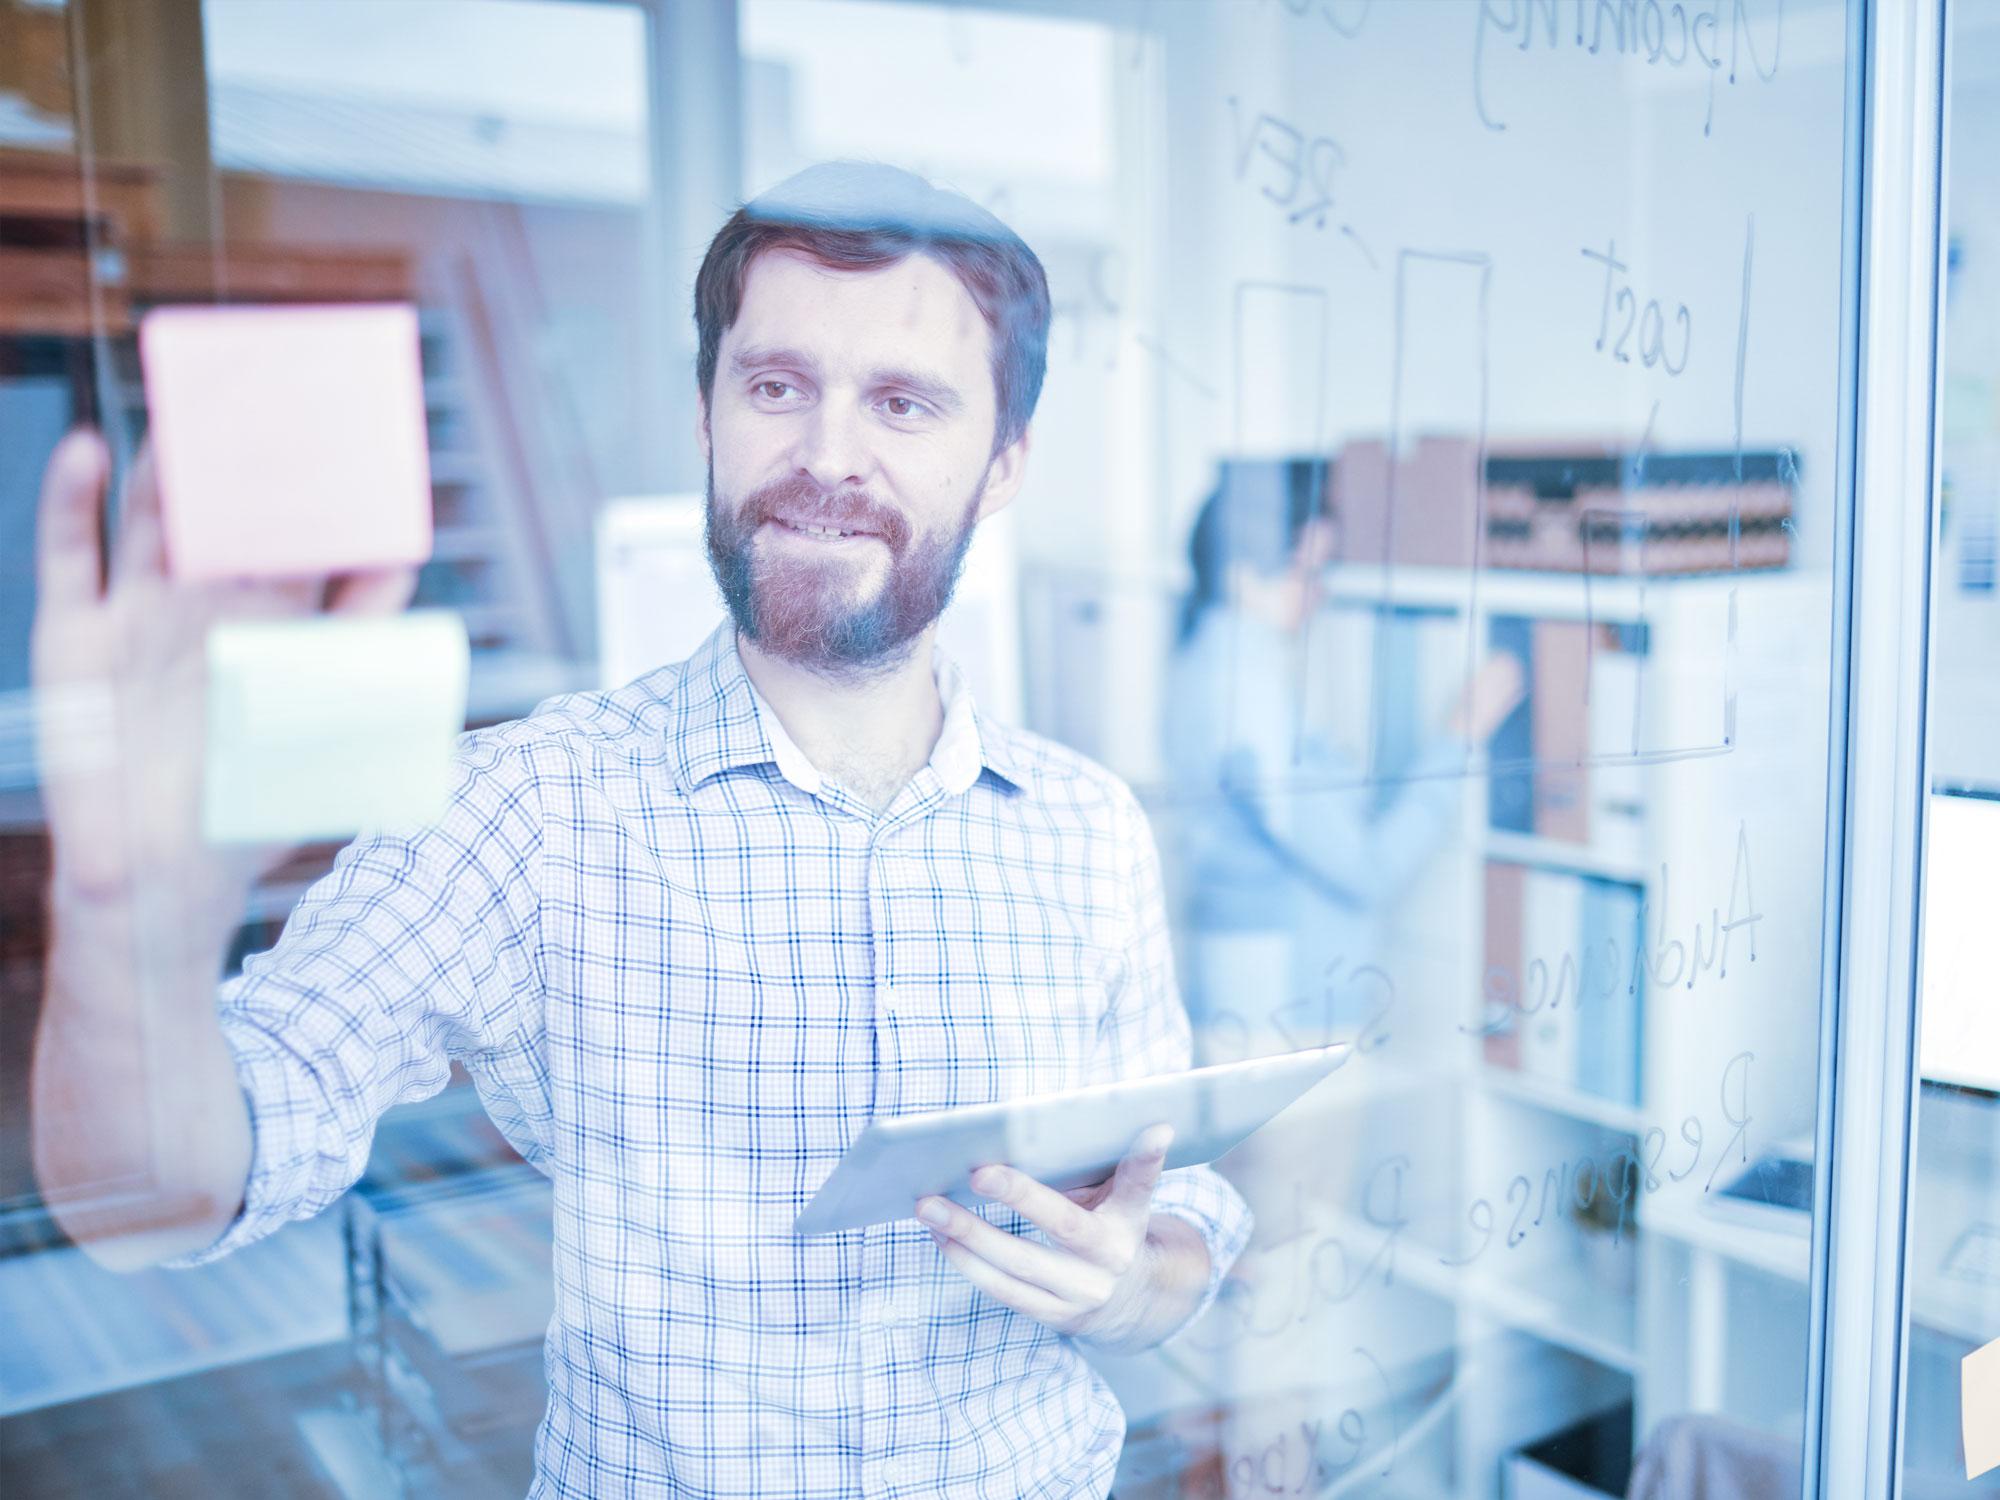 Modelo Agile competencias the Key Talent